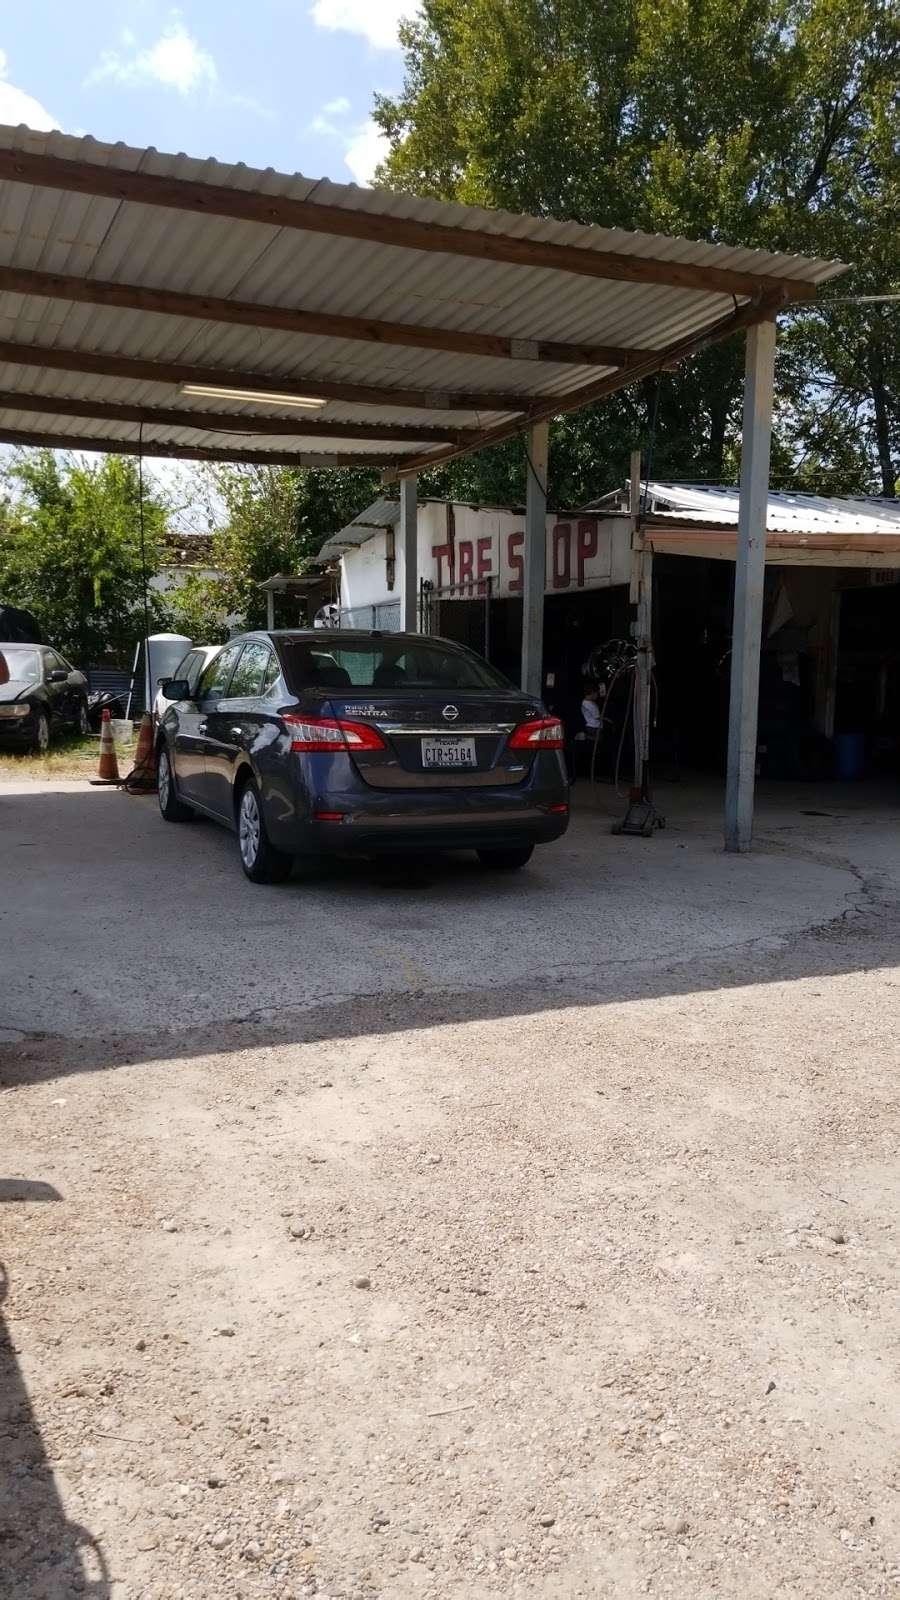 Arias Tire Shop & Auto Sales - car repair  | Photo 1 of 6 | Address: 10601 Airline Dr, Houston, TX 77037, USA | Phone: (832) 564-5554